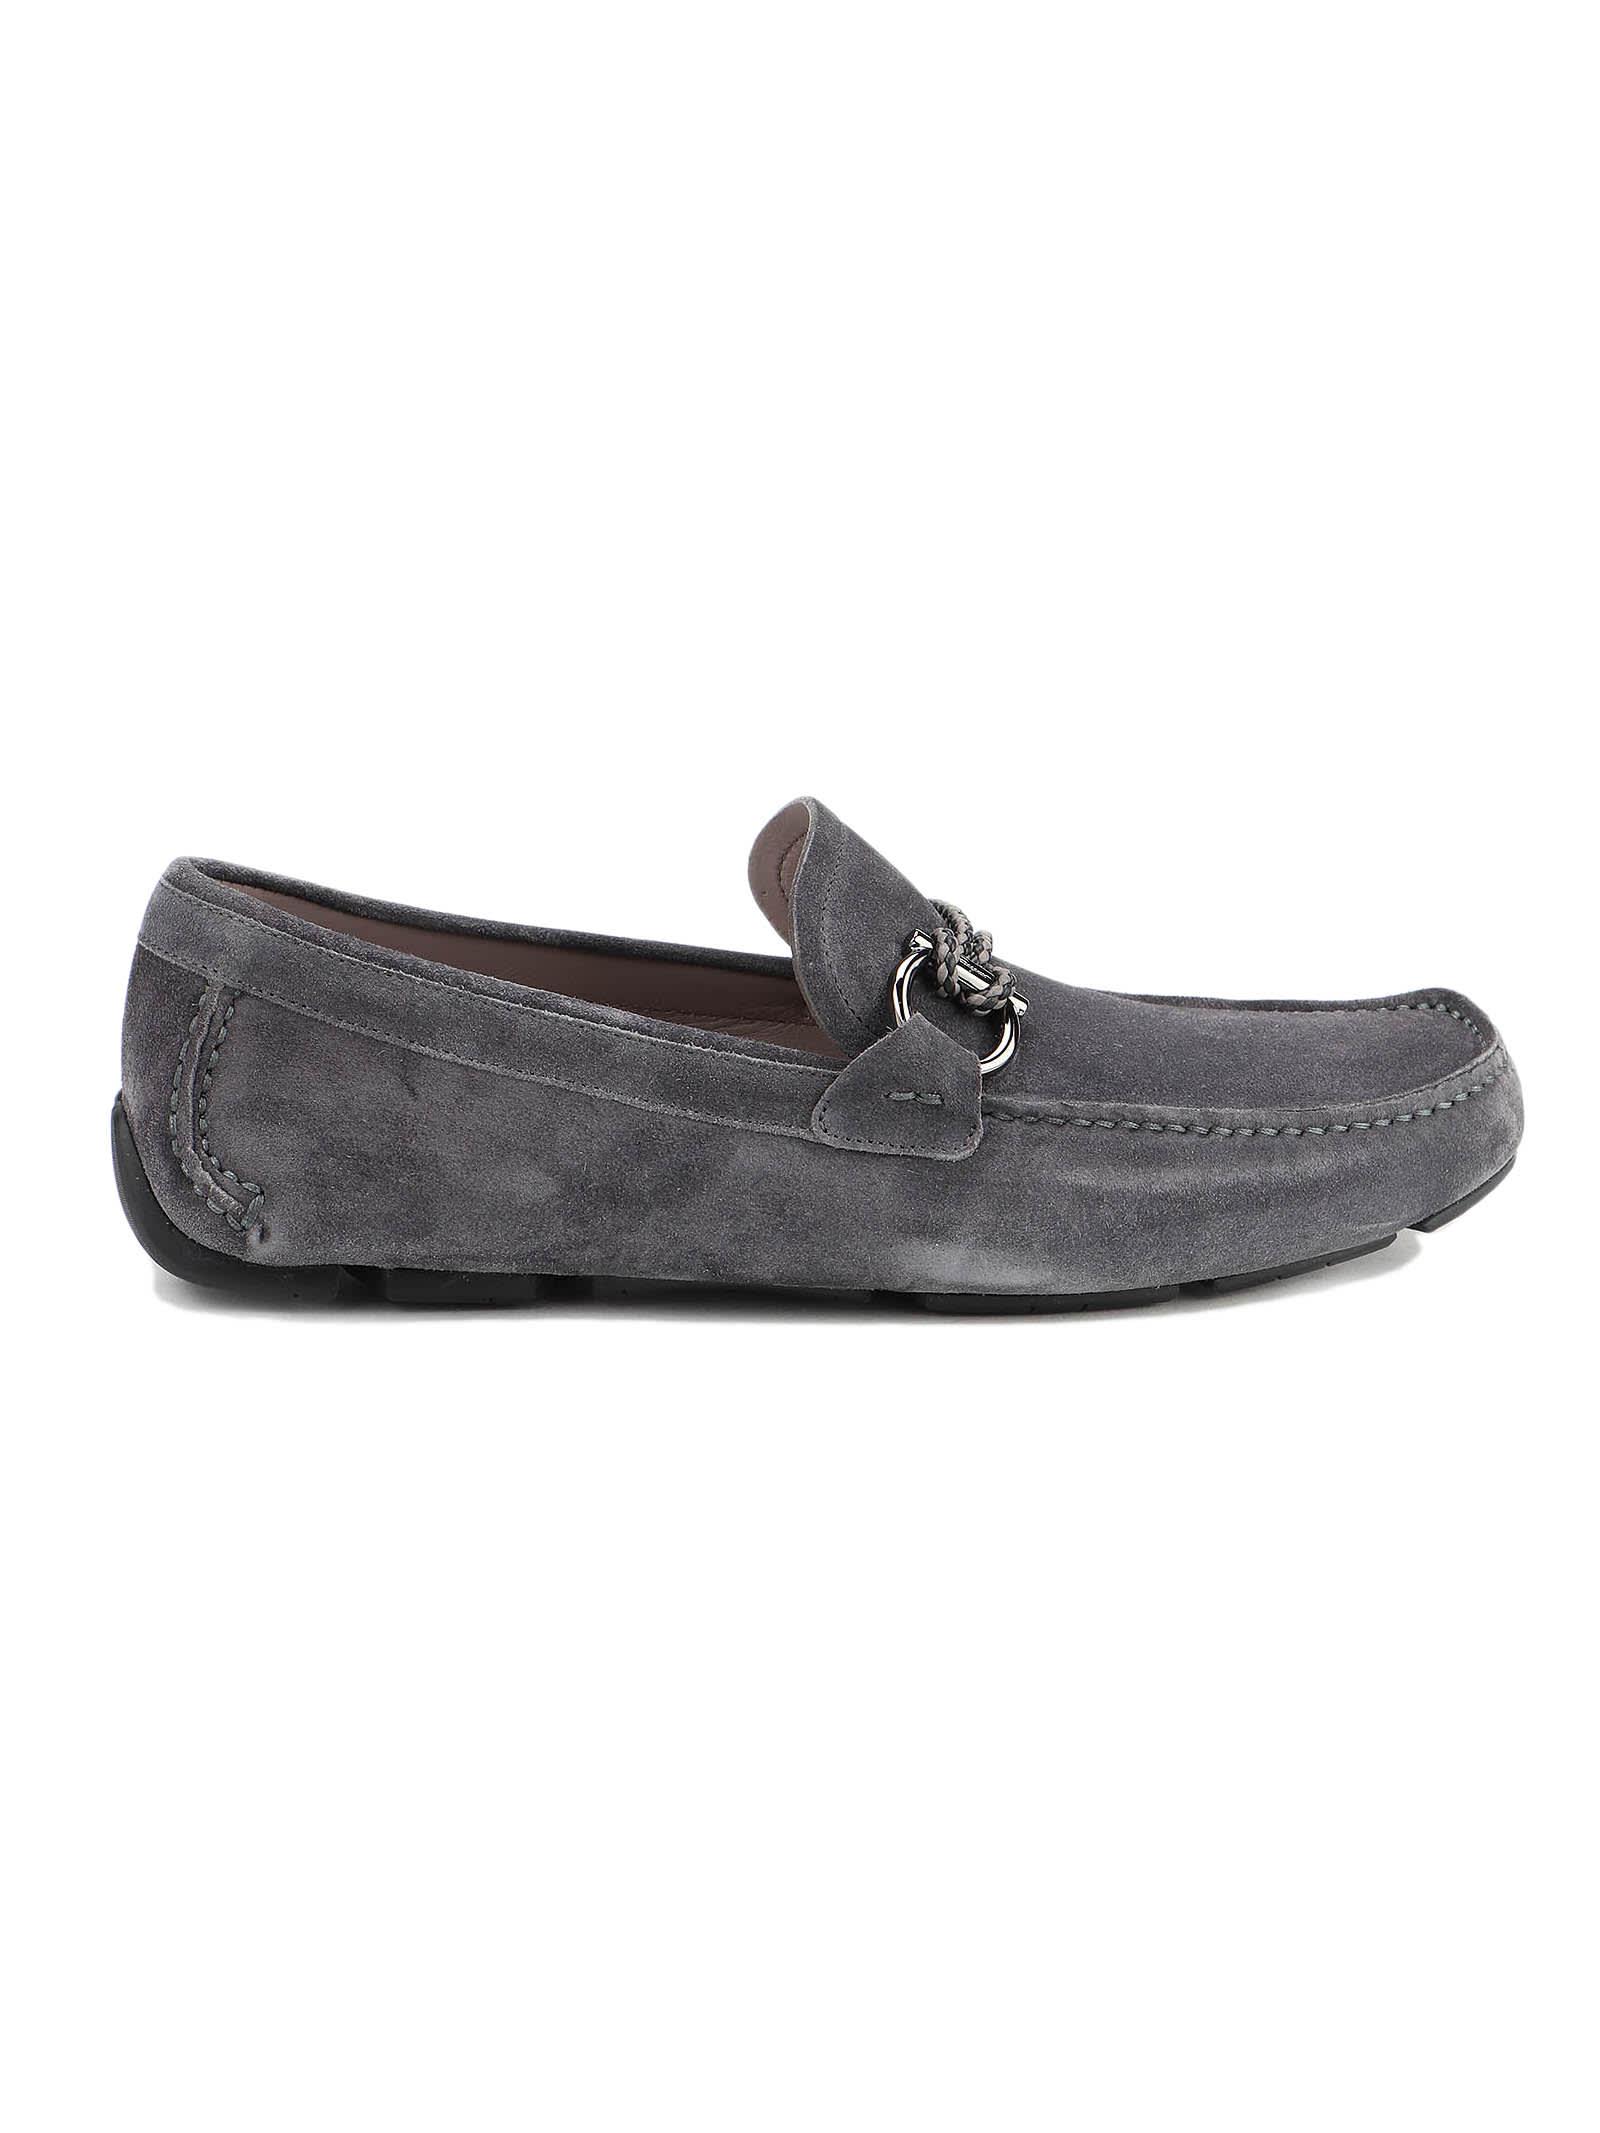 Salvatore Ferragamo Loafers FRONT 4 LOAFER